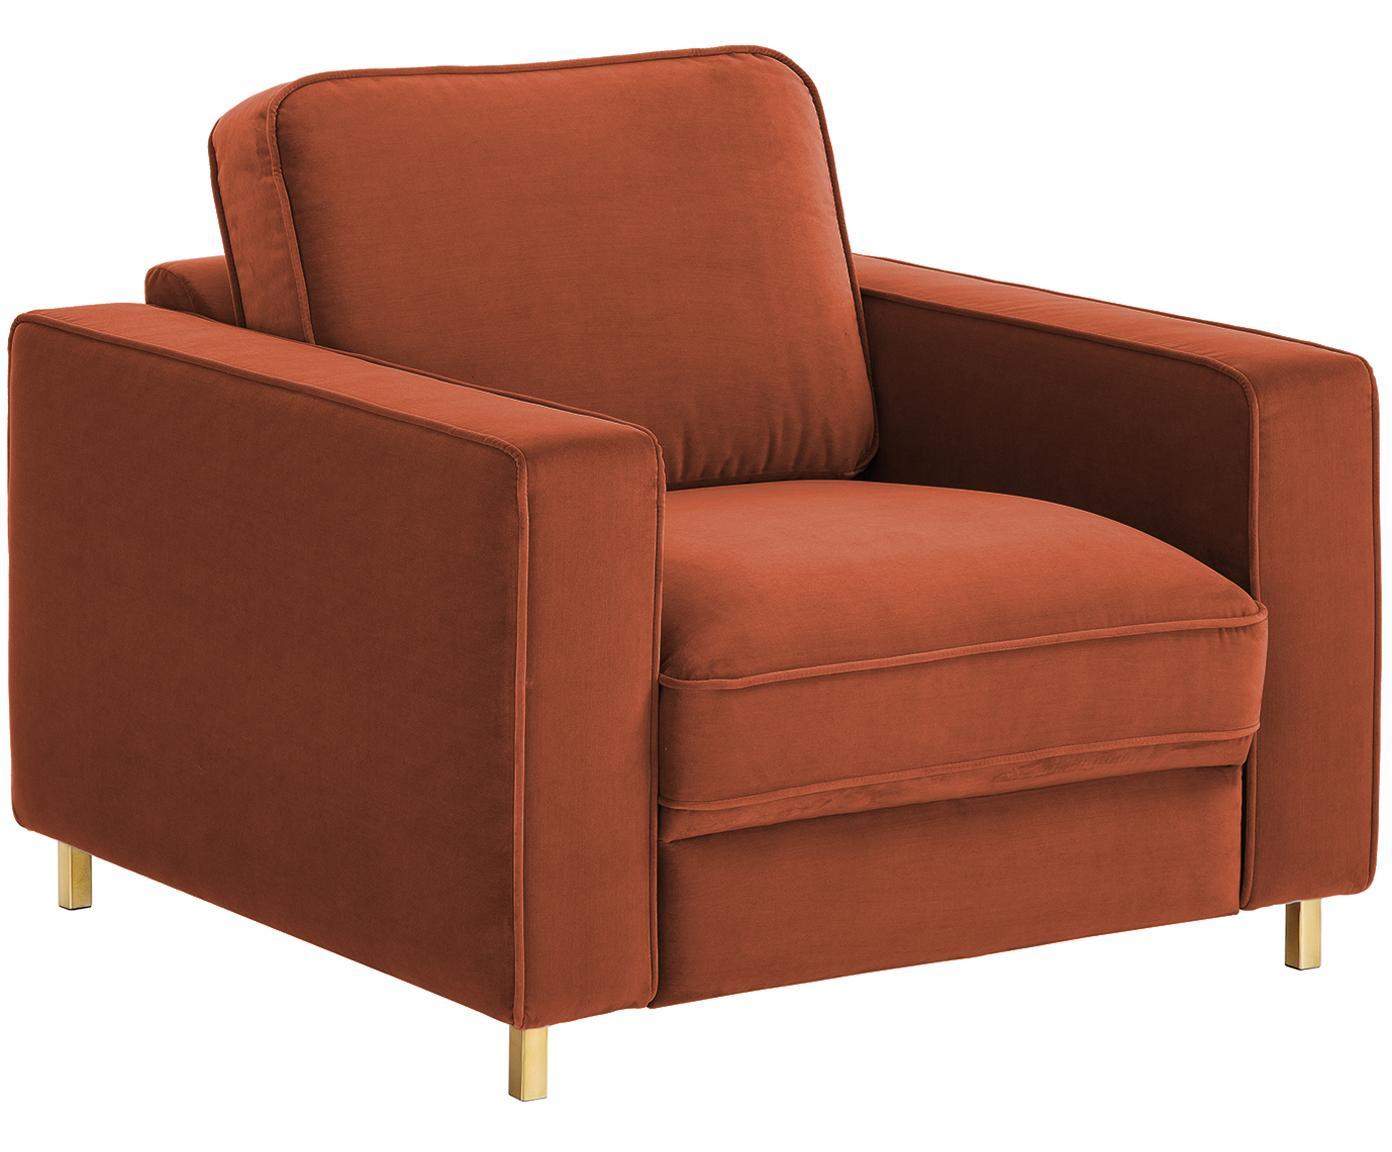 Samt-Sessel Chelsea, Bezug: Samt (Hochwertiger Polyes, Gestell: Massives Fichtenholz, Samt Rostrot, B 83 x T 93 cm